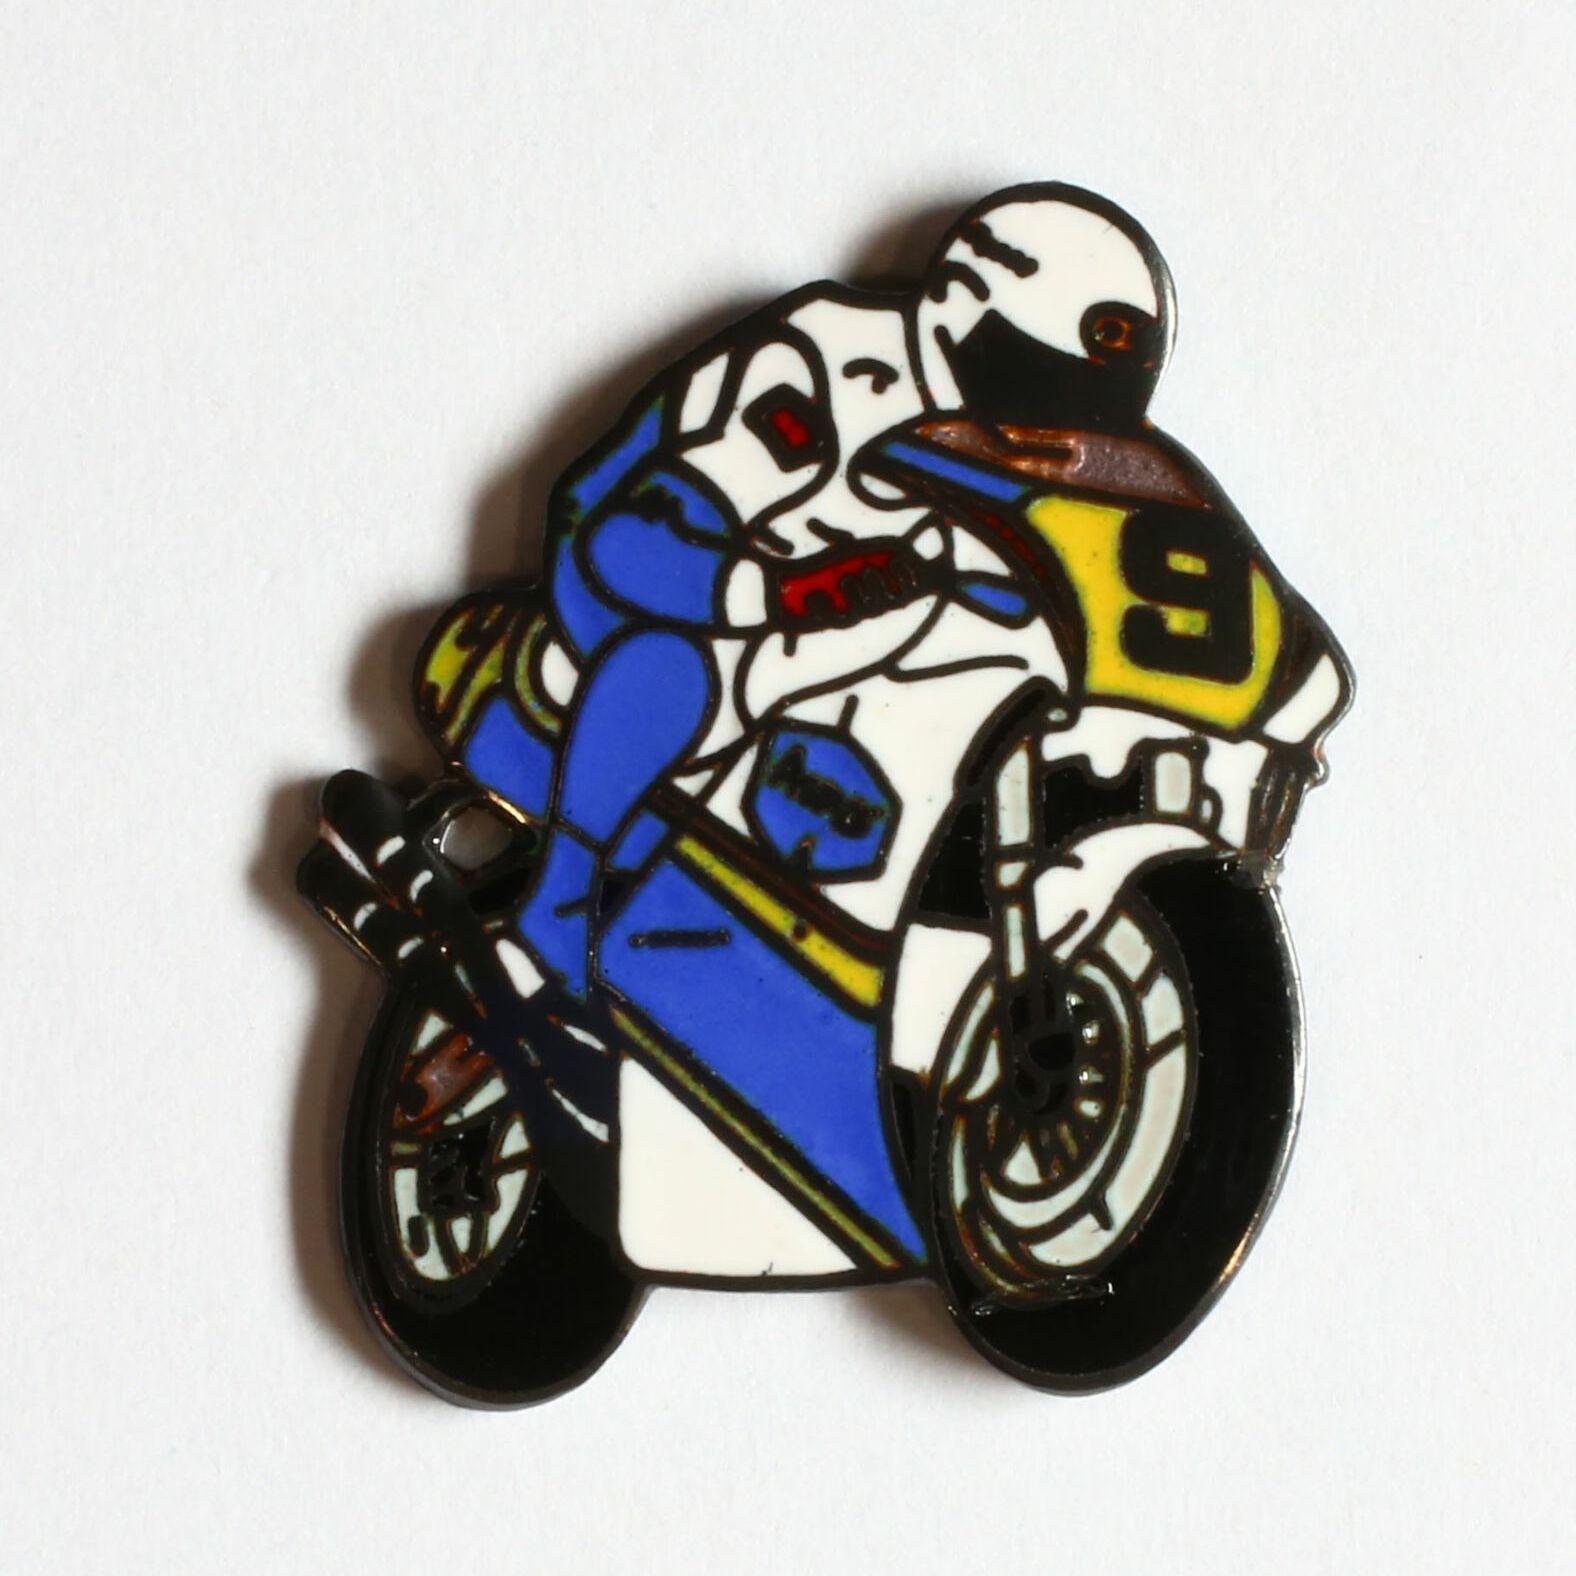 Moto de course - blanche et bleu